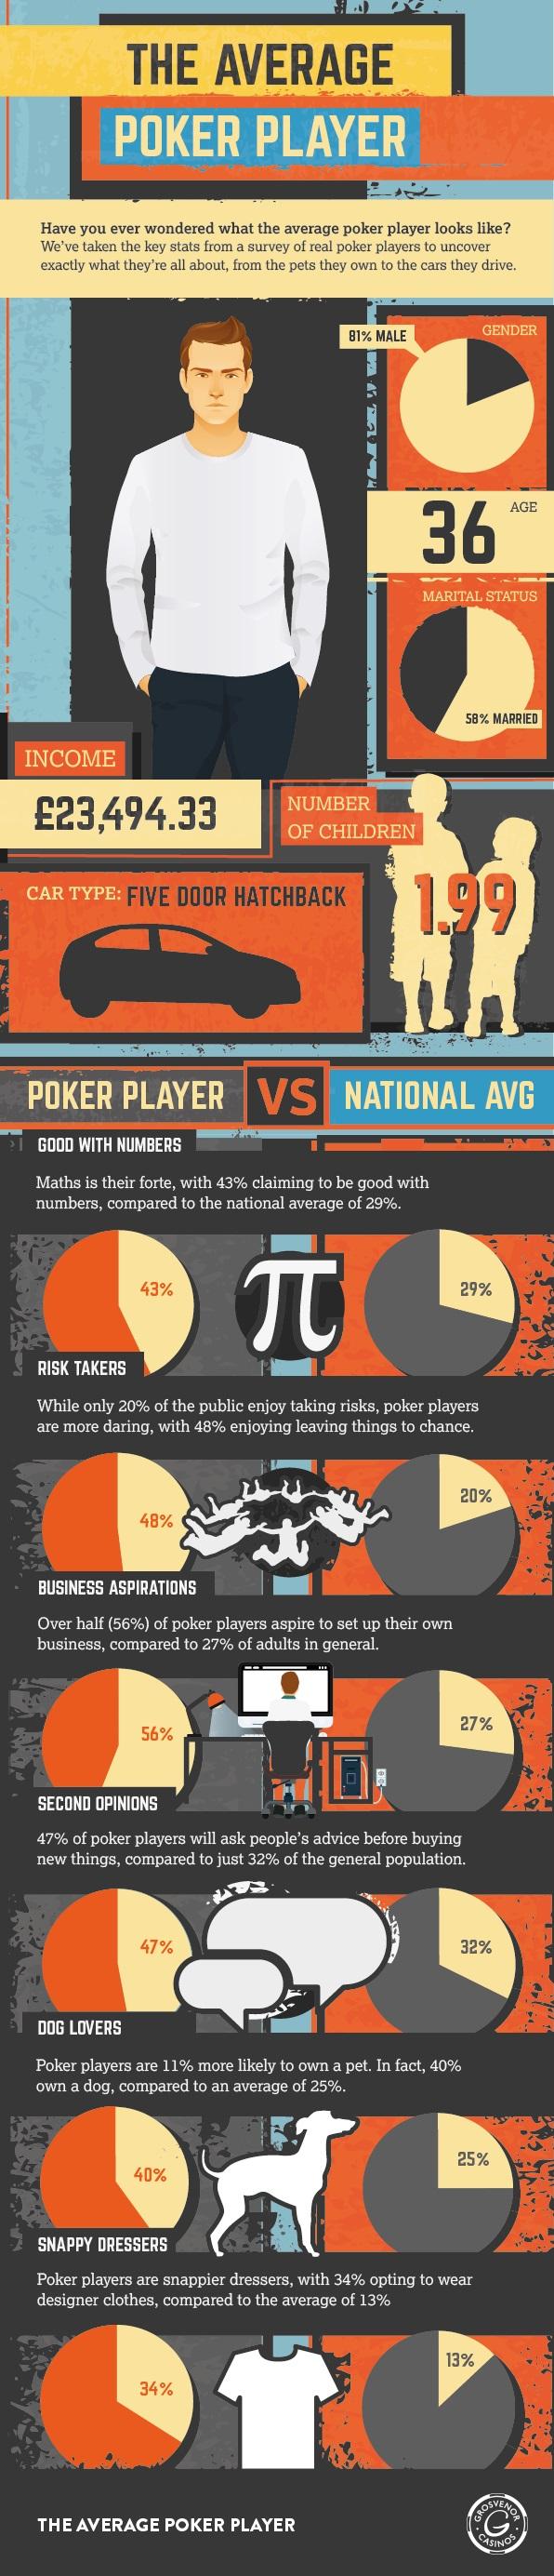 Average-poker-player-01